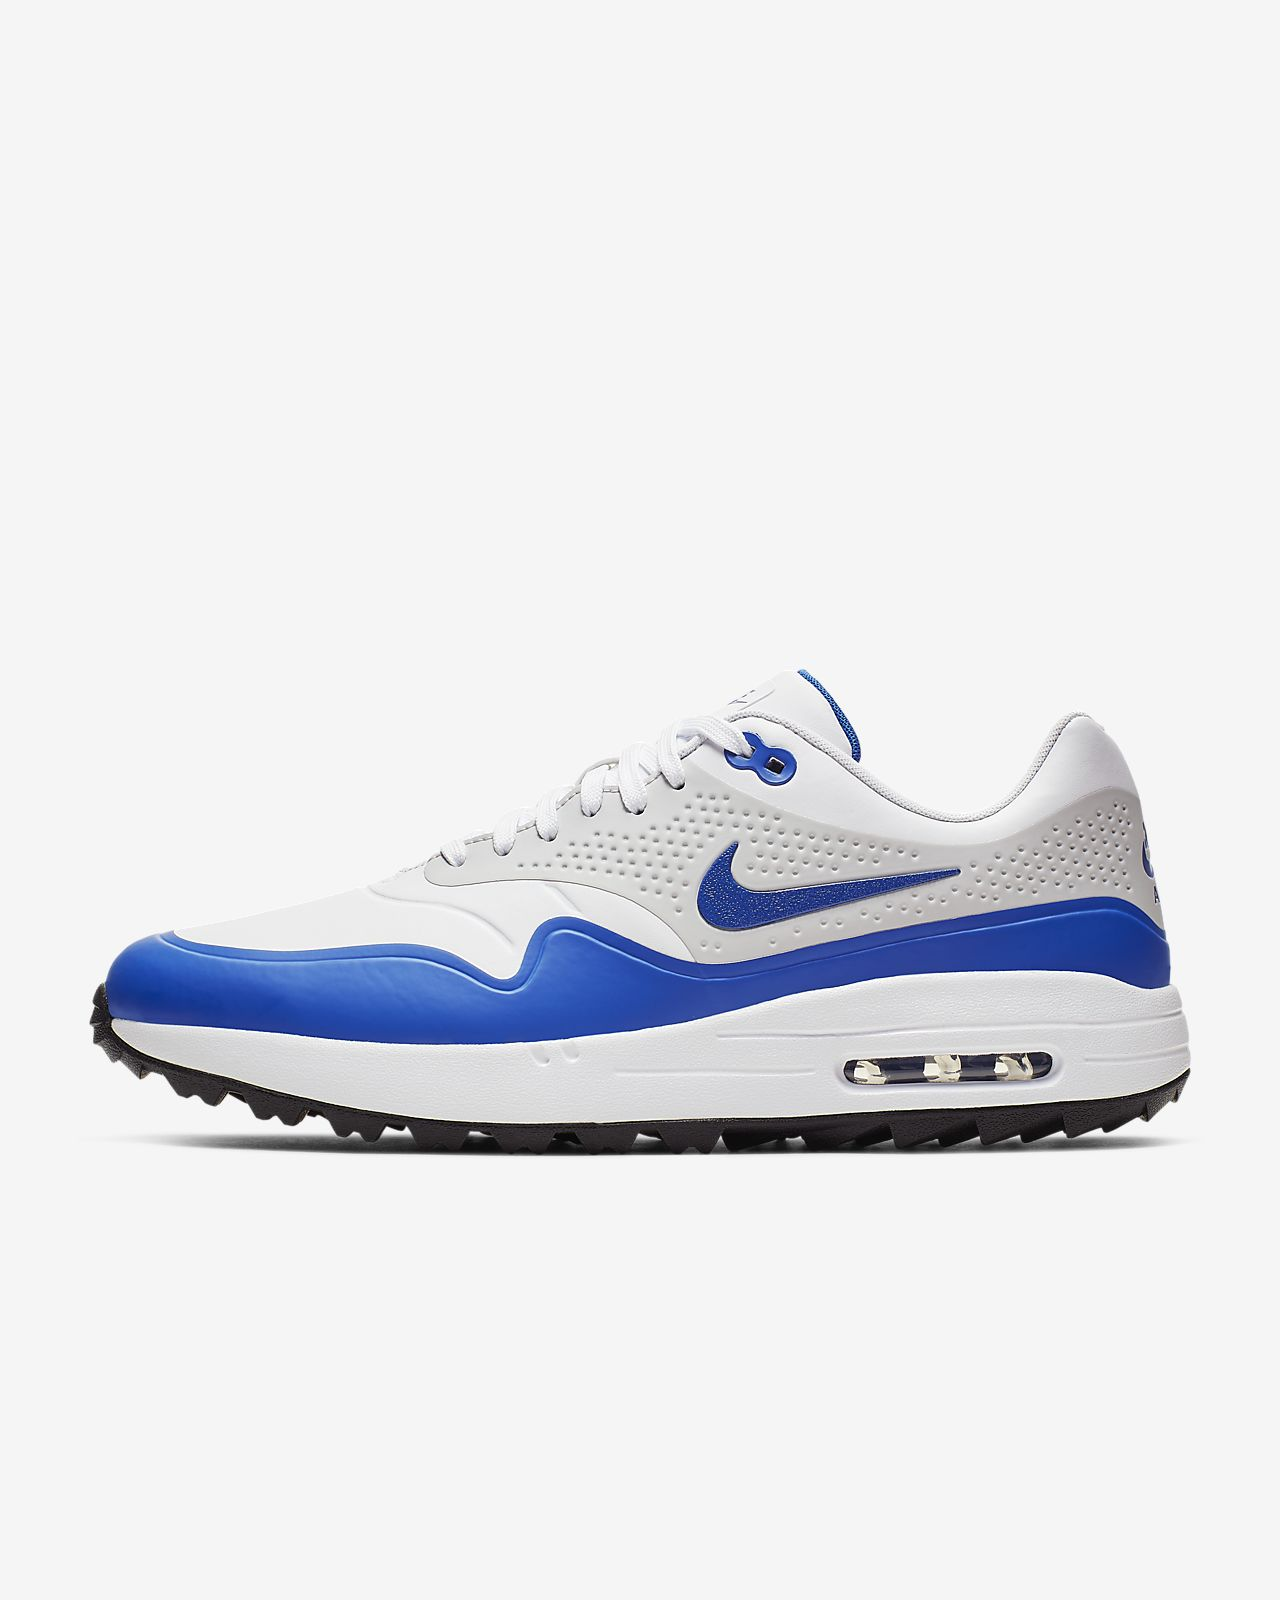 nike sportswear air max 1 Remise